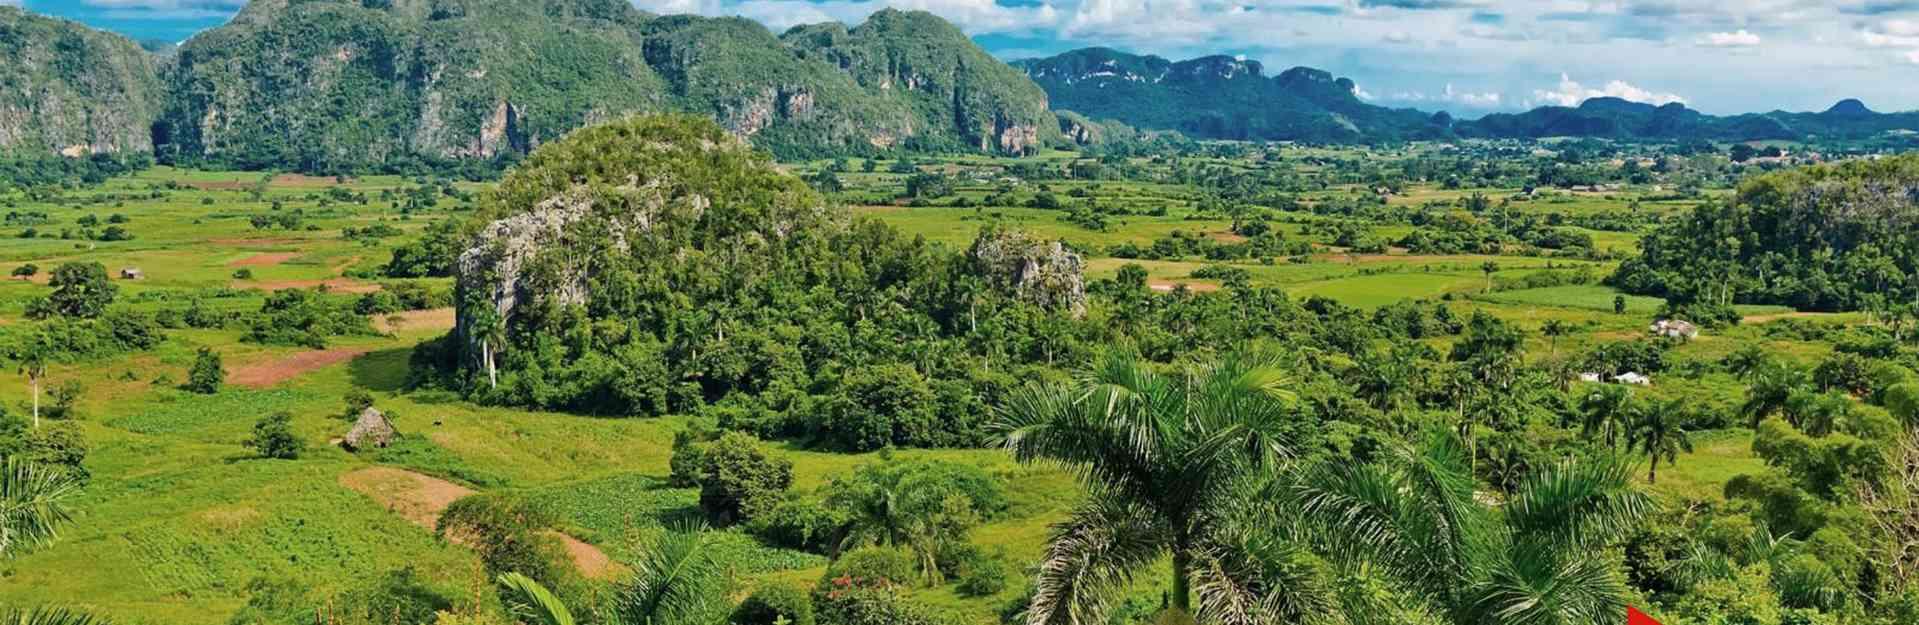 Tourism In Cuba Nature In Cuba Cuba Travel